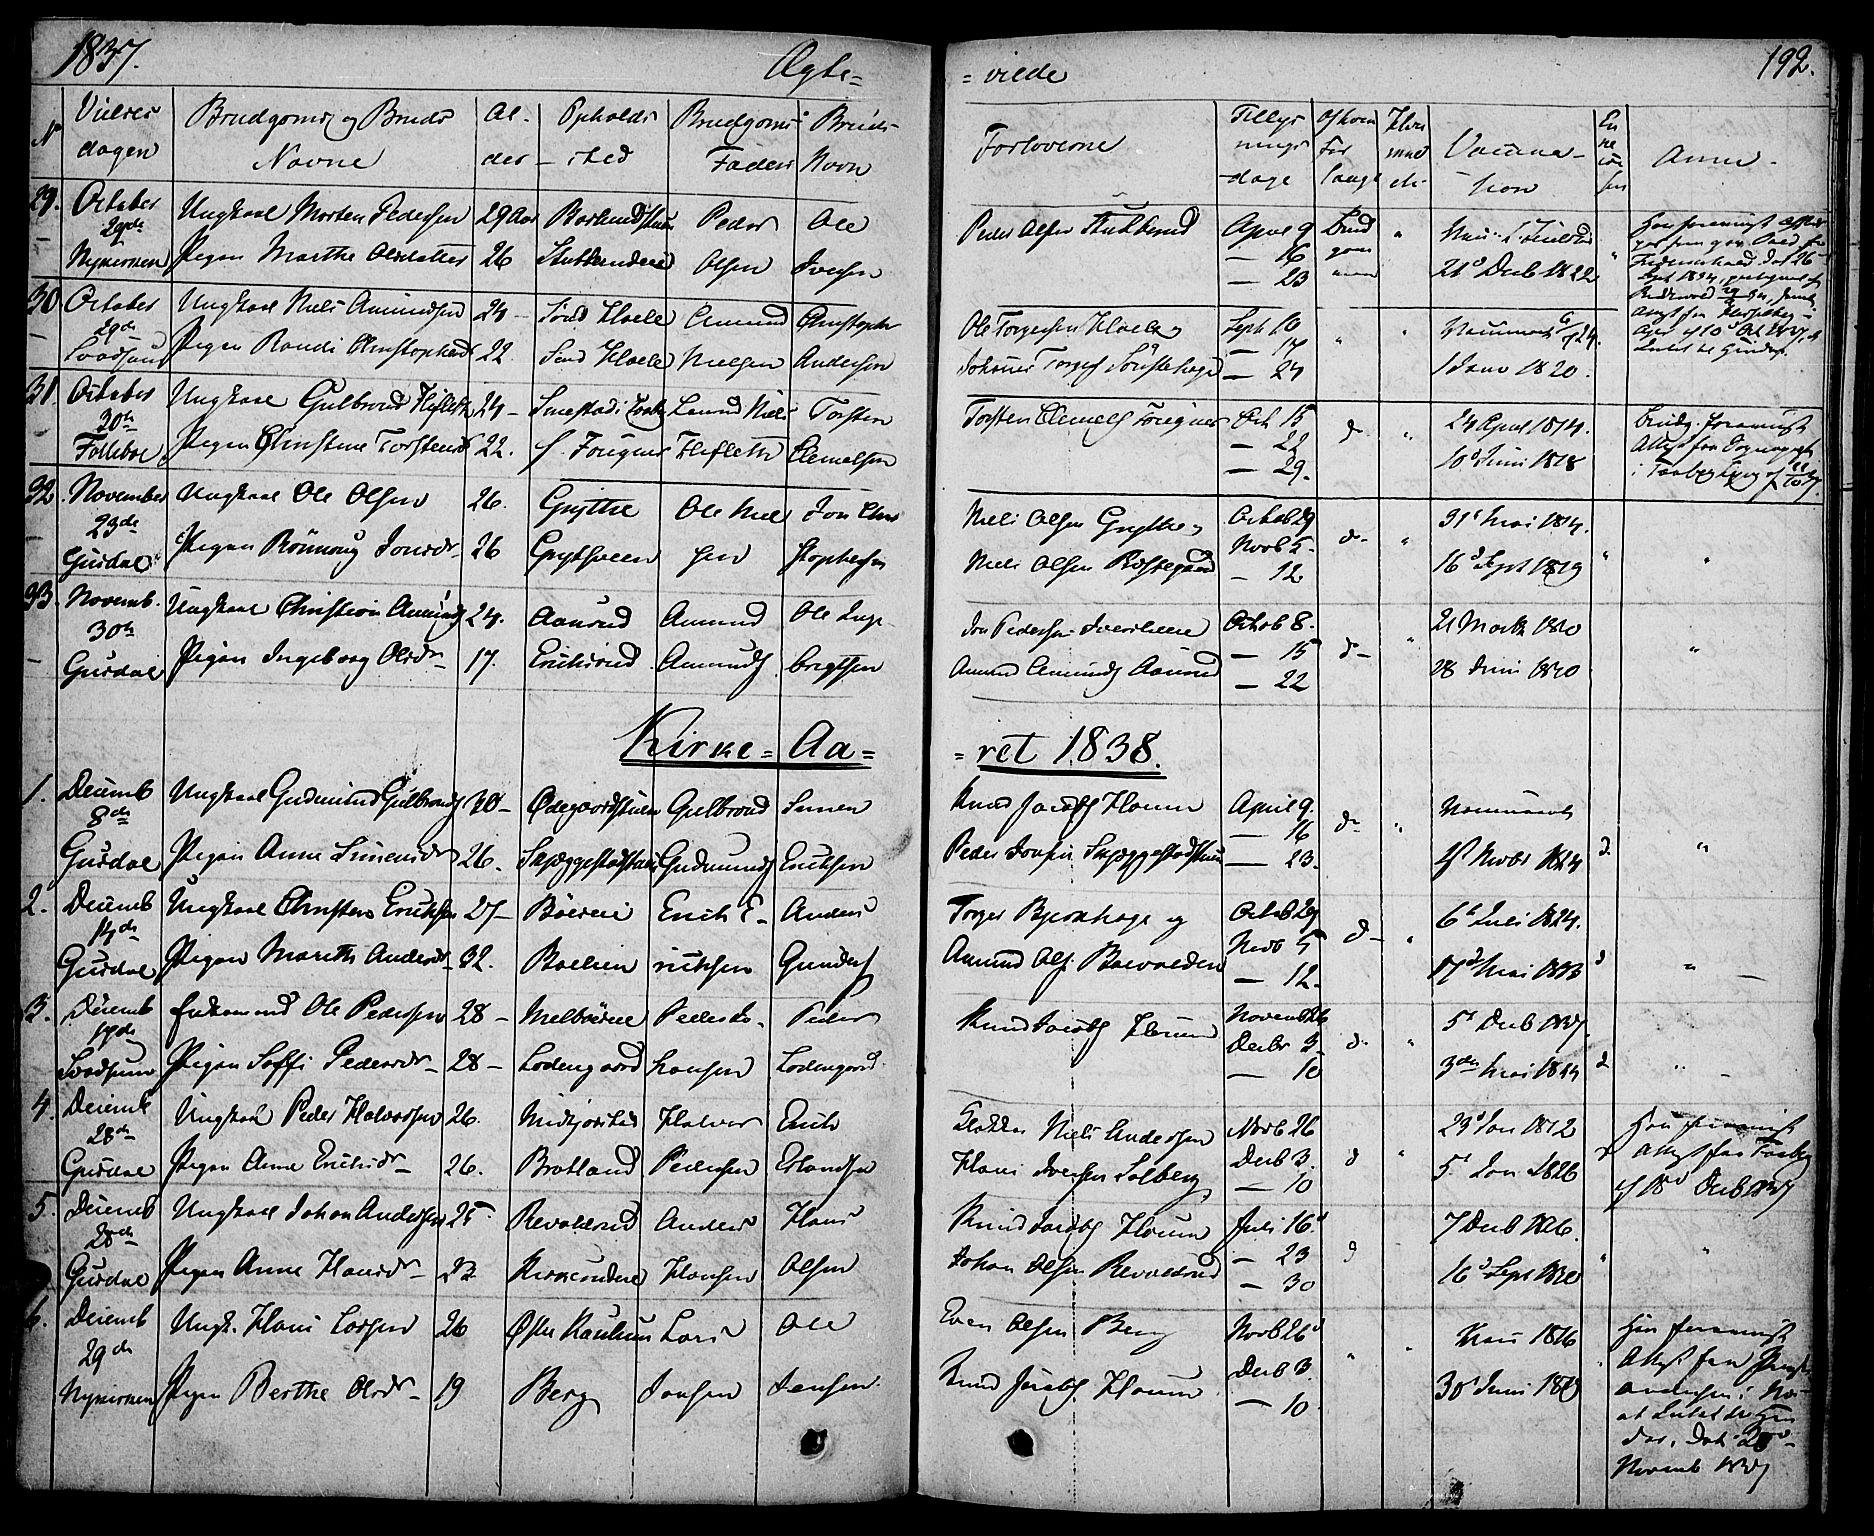 SAH, Gausdal prestekontor, Ministerialbok nr. 6, 1830-1839, s. 192